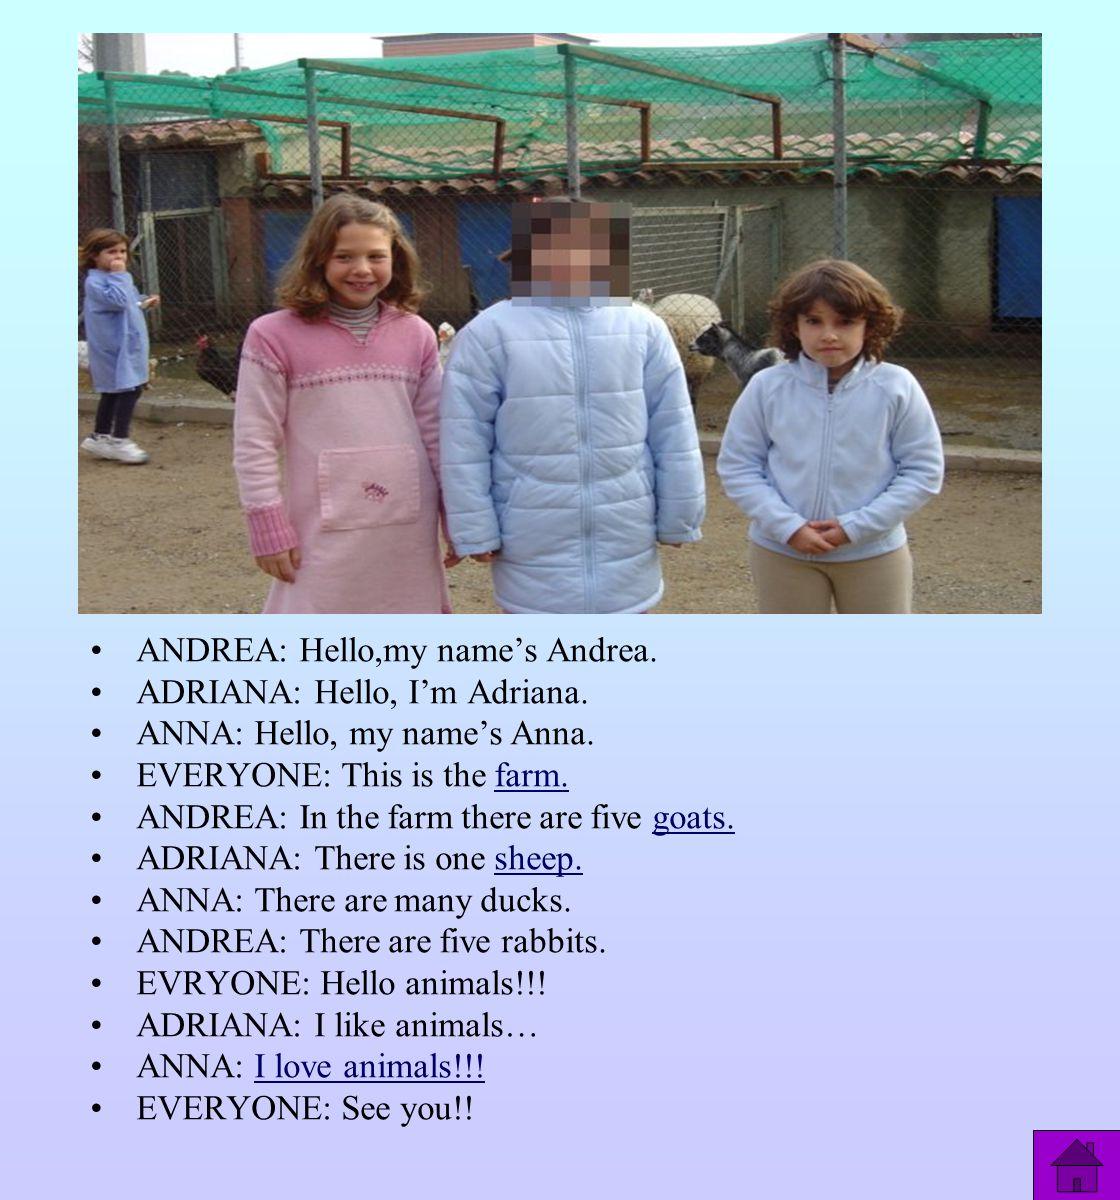 ANDREA: Hello,my name's Andrea. ADRIANA: Hello, I'm Adriana. ANNA: Hello, my name's Anna. EVERYONE: This is the farm.farm. ANDREA: In the farm there a